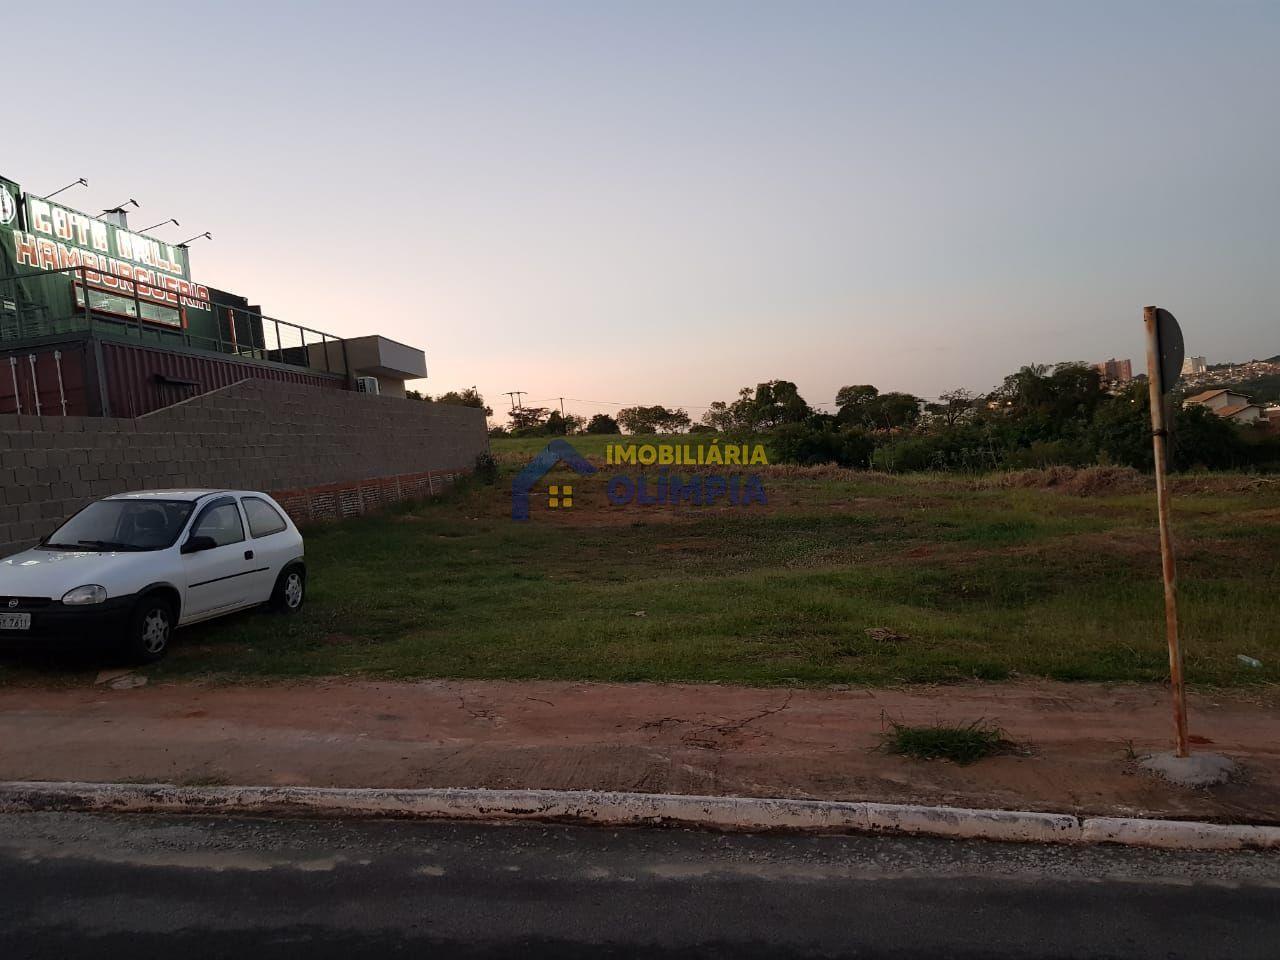 Terreno/Lote à venda  no Jardim Tropical - OlÍmpia, SP. Imóveis